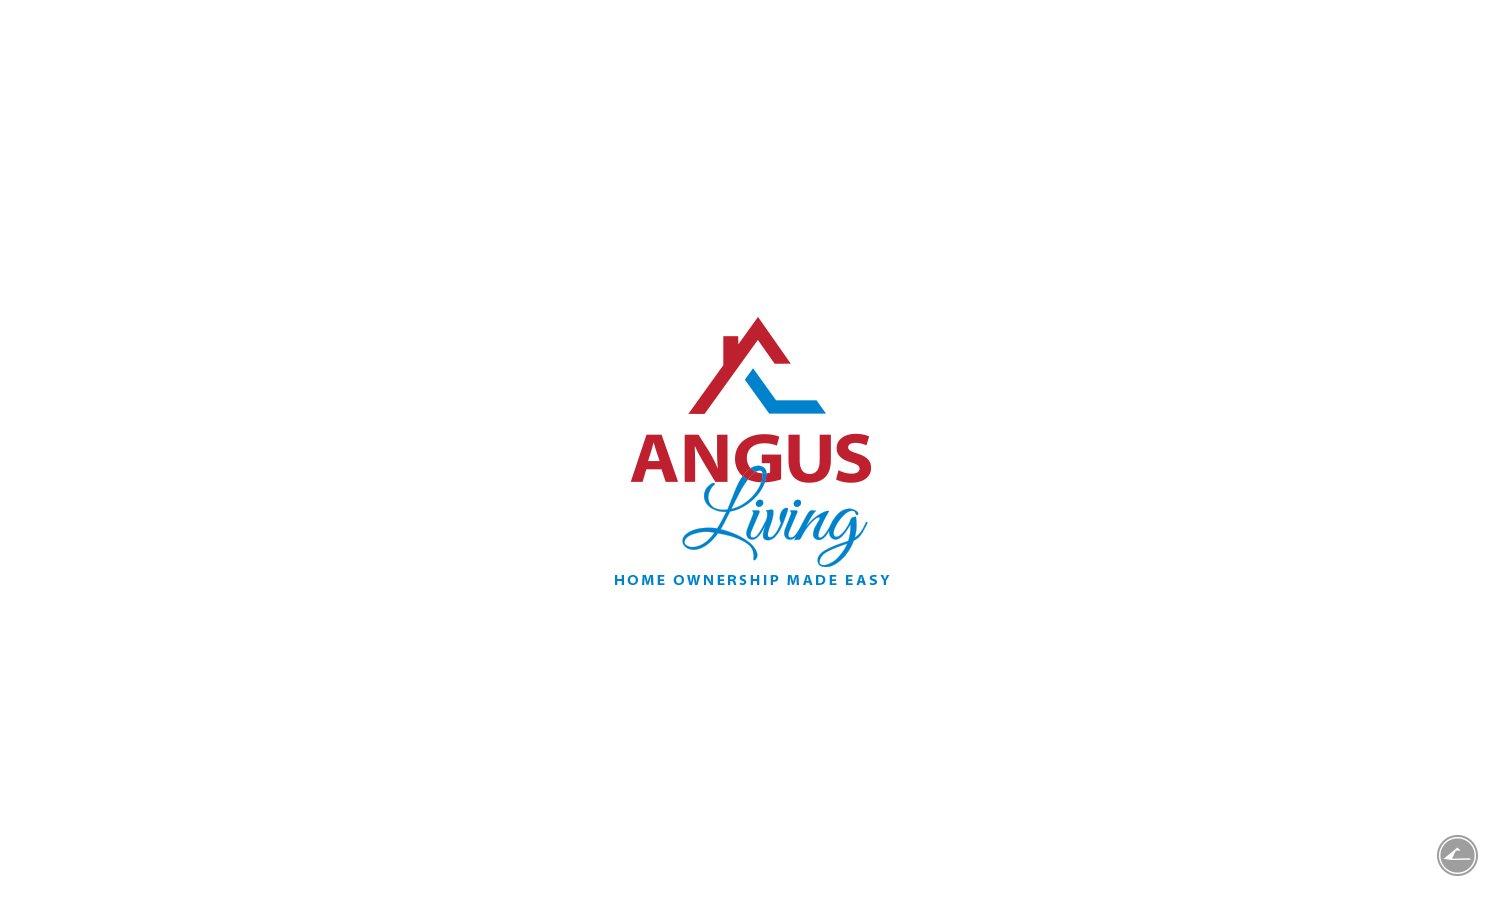 angus_living_logo0